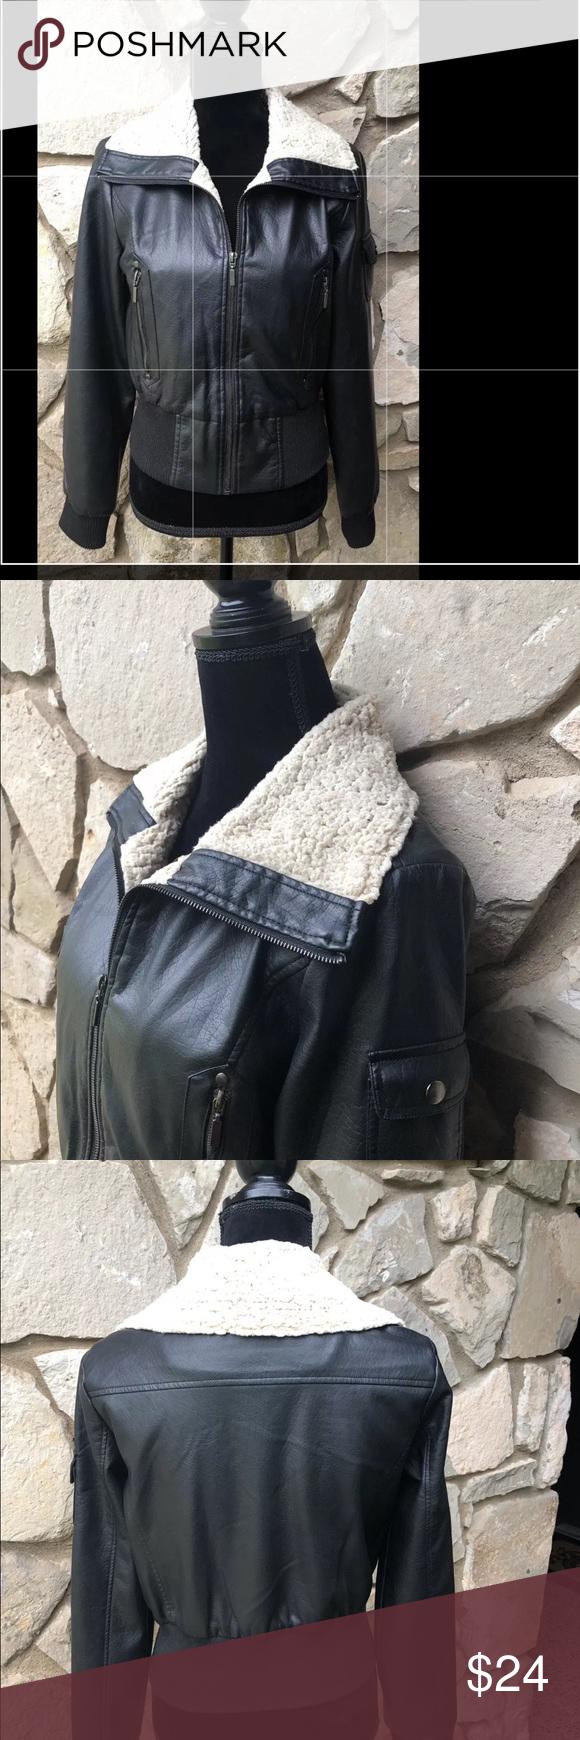 Yoki Faux Leather Jacket Yoki Outerwear Black Faux Leather Moto Jacket Size M Serpa Collar Fr Black Faux Leather Moto Jacket Street Style Jacket Clothes Design [ 1740 x 580 Pixel ]